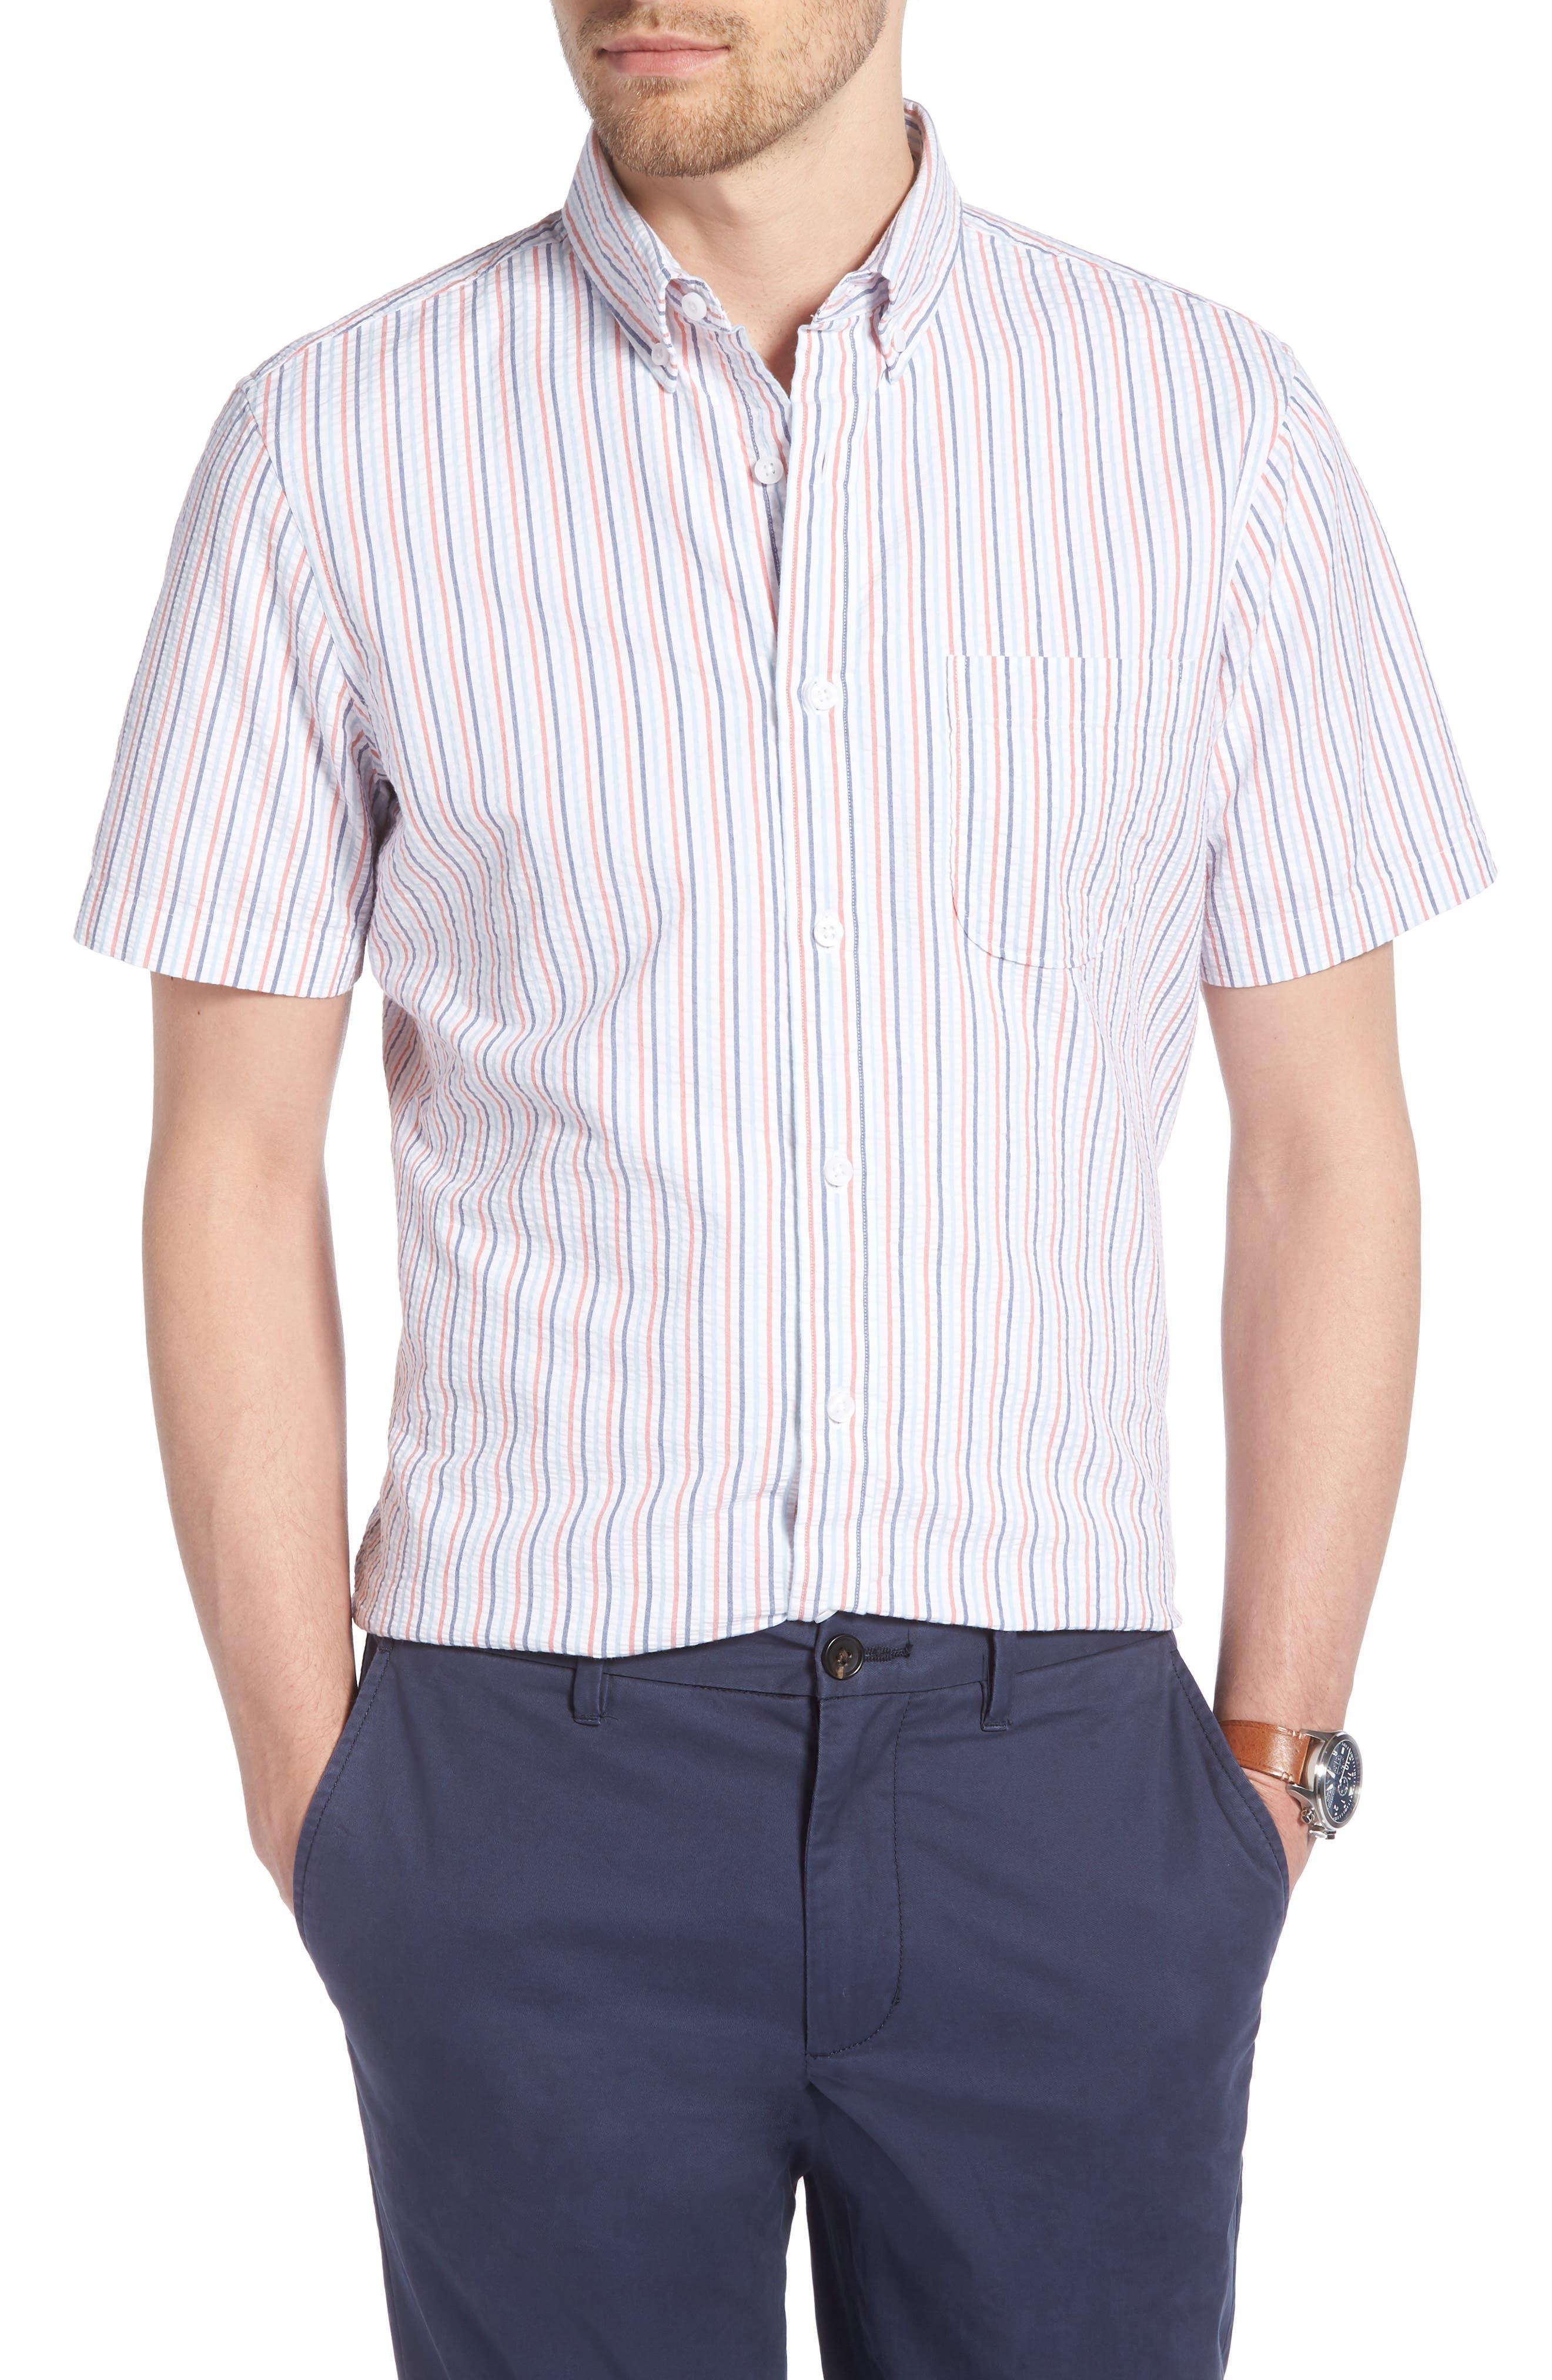 Trim Fit Seersucker Short Sleeve Sport Shirt,                             Main thumbnail 1, color,                             White Multi Pencil Stripe